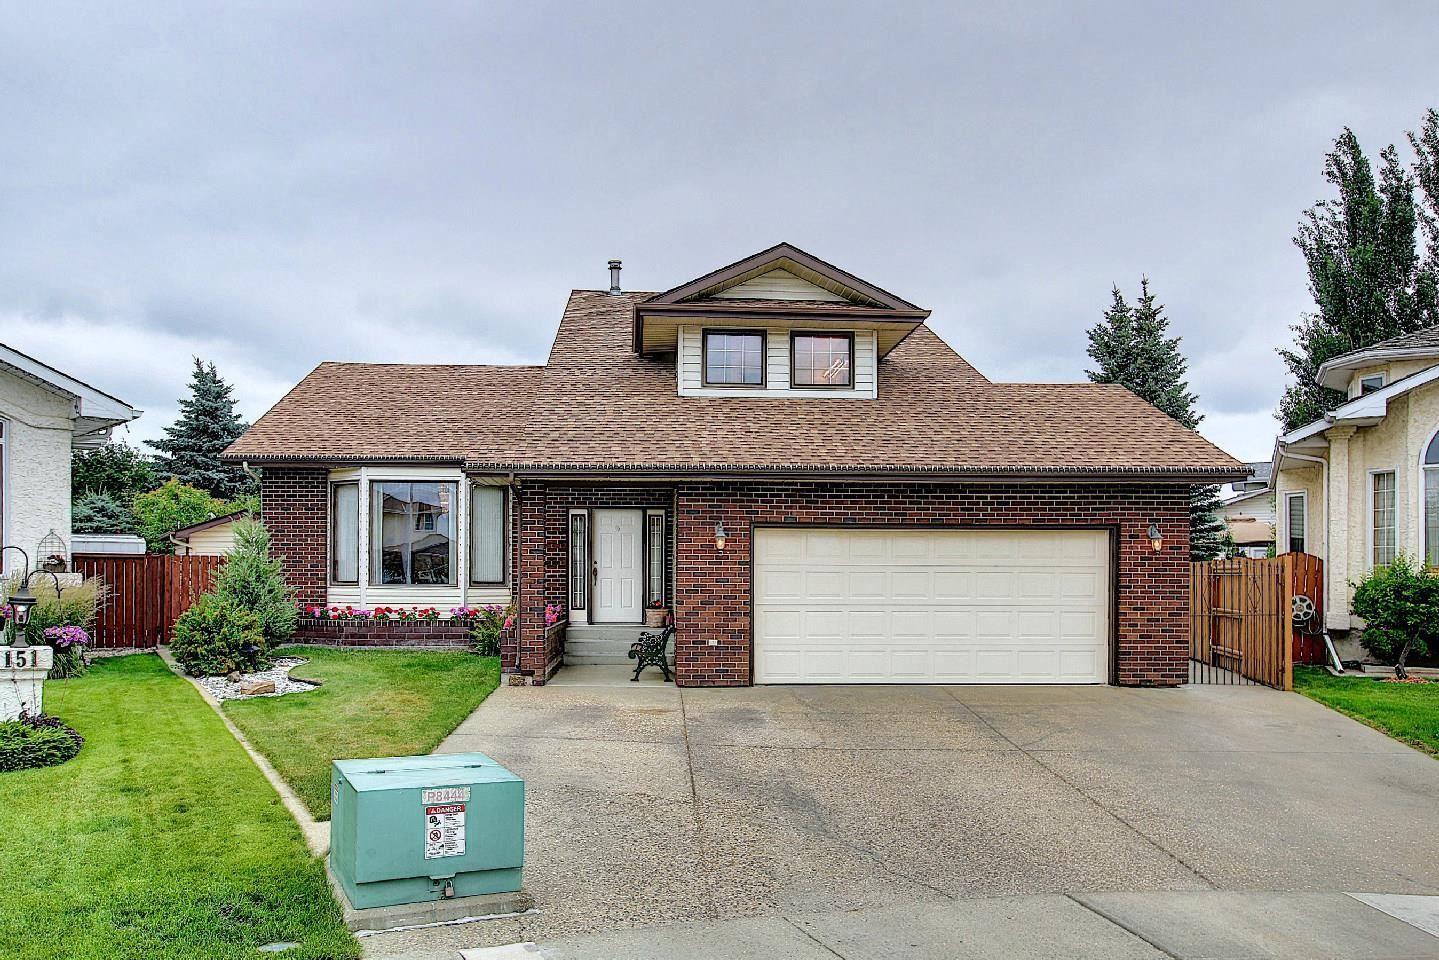 Main Photo: 147 MAYLIEWAN Close in Edmonton: Zone 28 House for sale : MLS®# E4254143